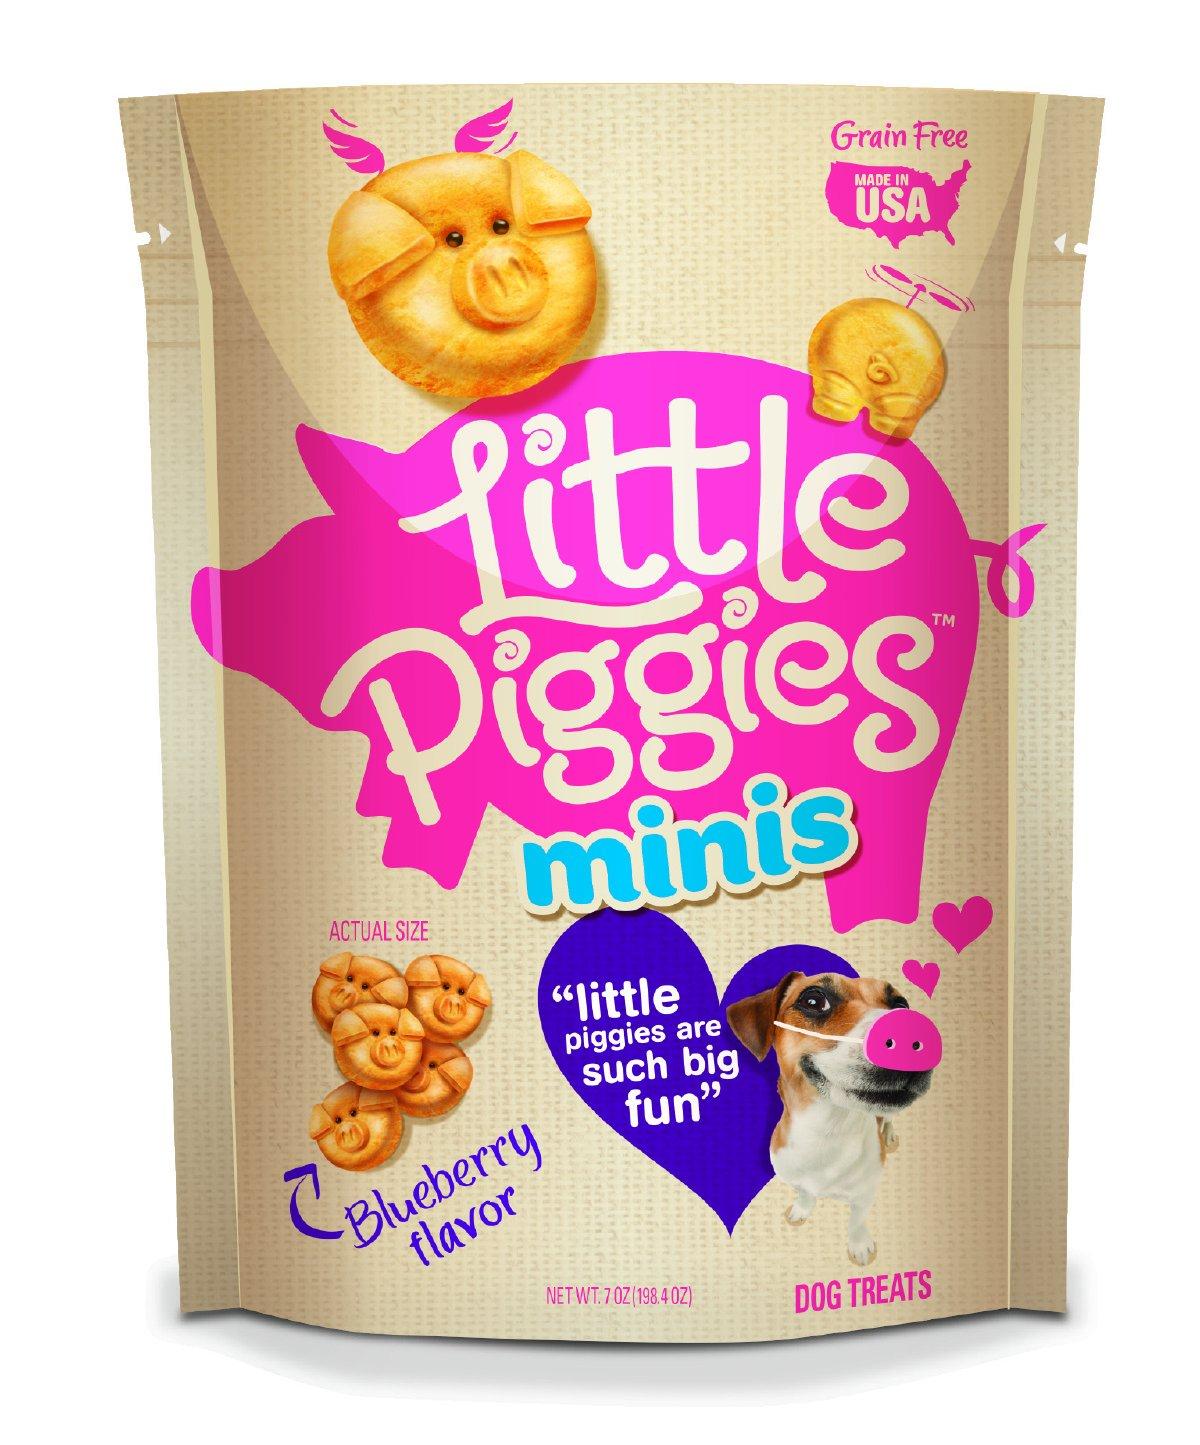 Little Piggies Minis Dog Treats blueeberry Flavor, 7 Oz